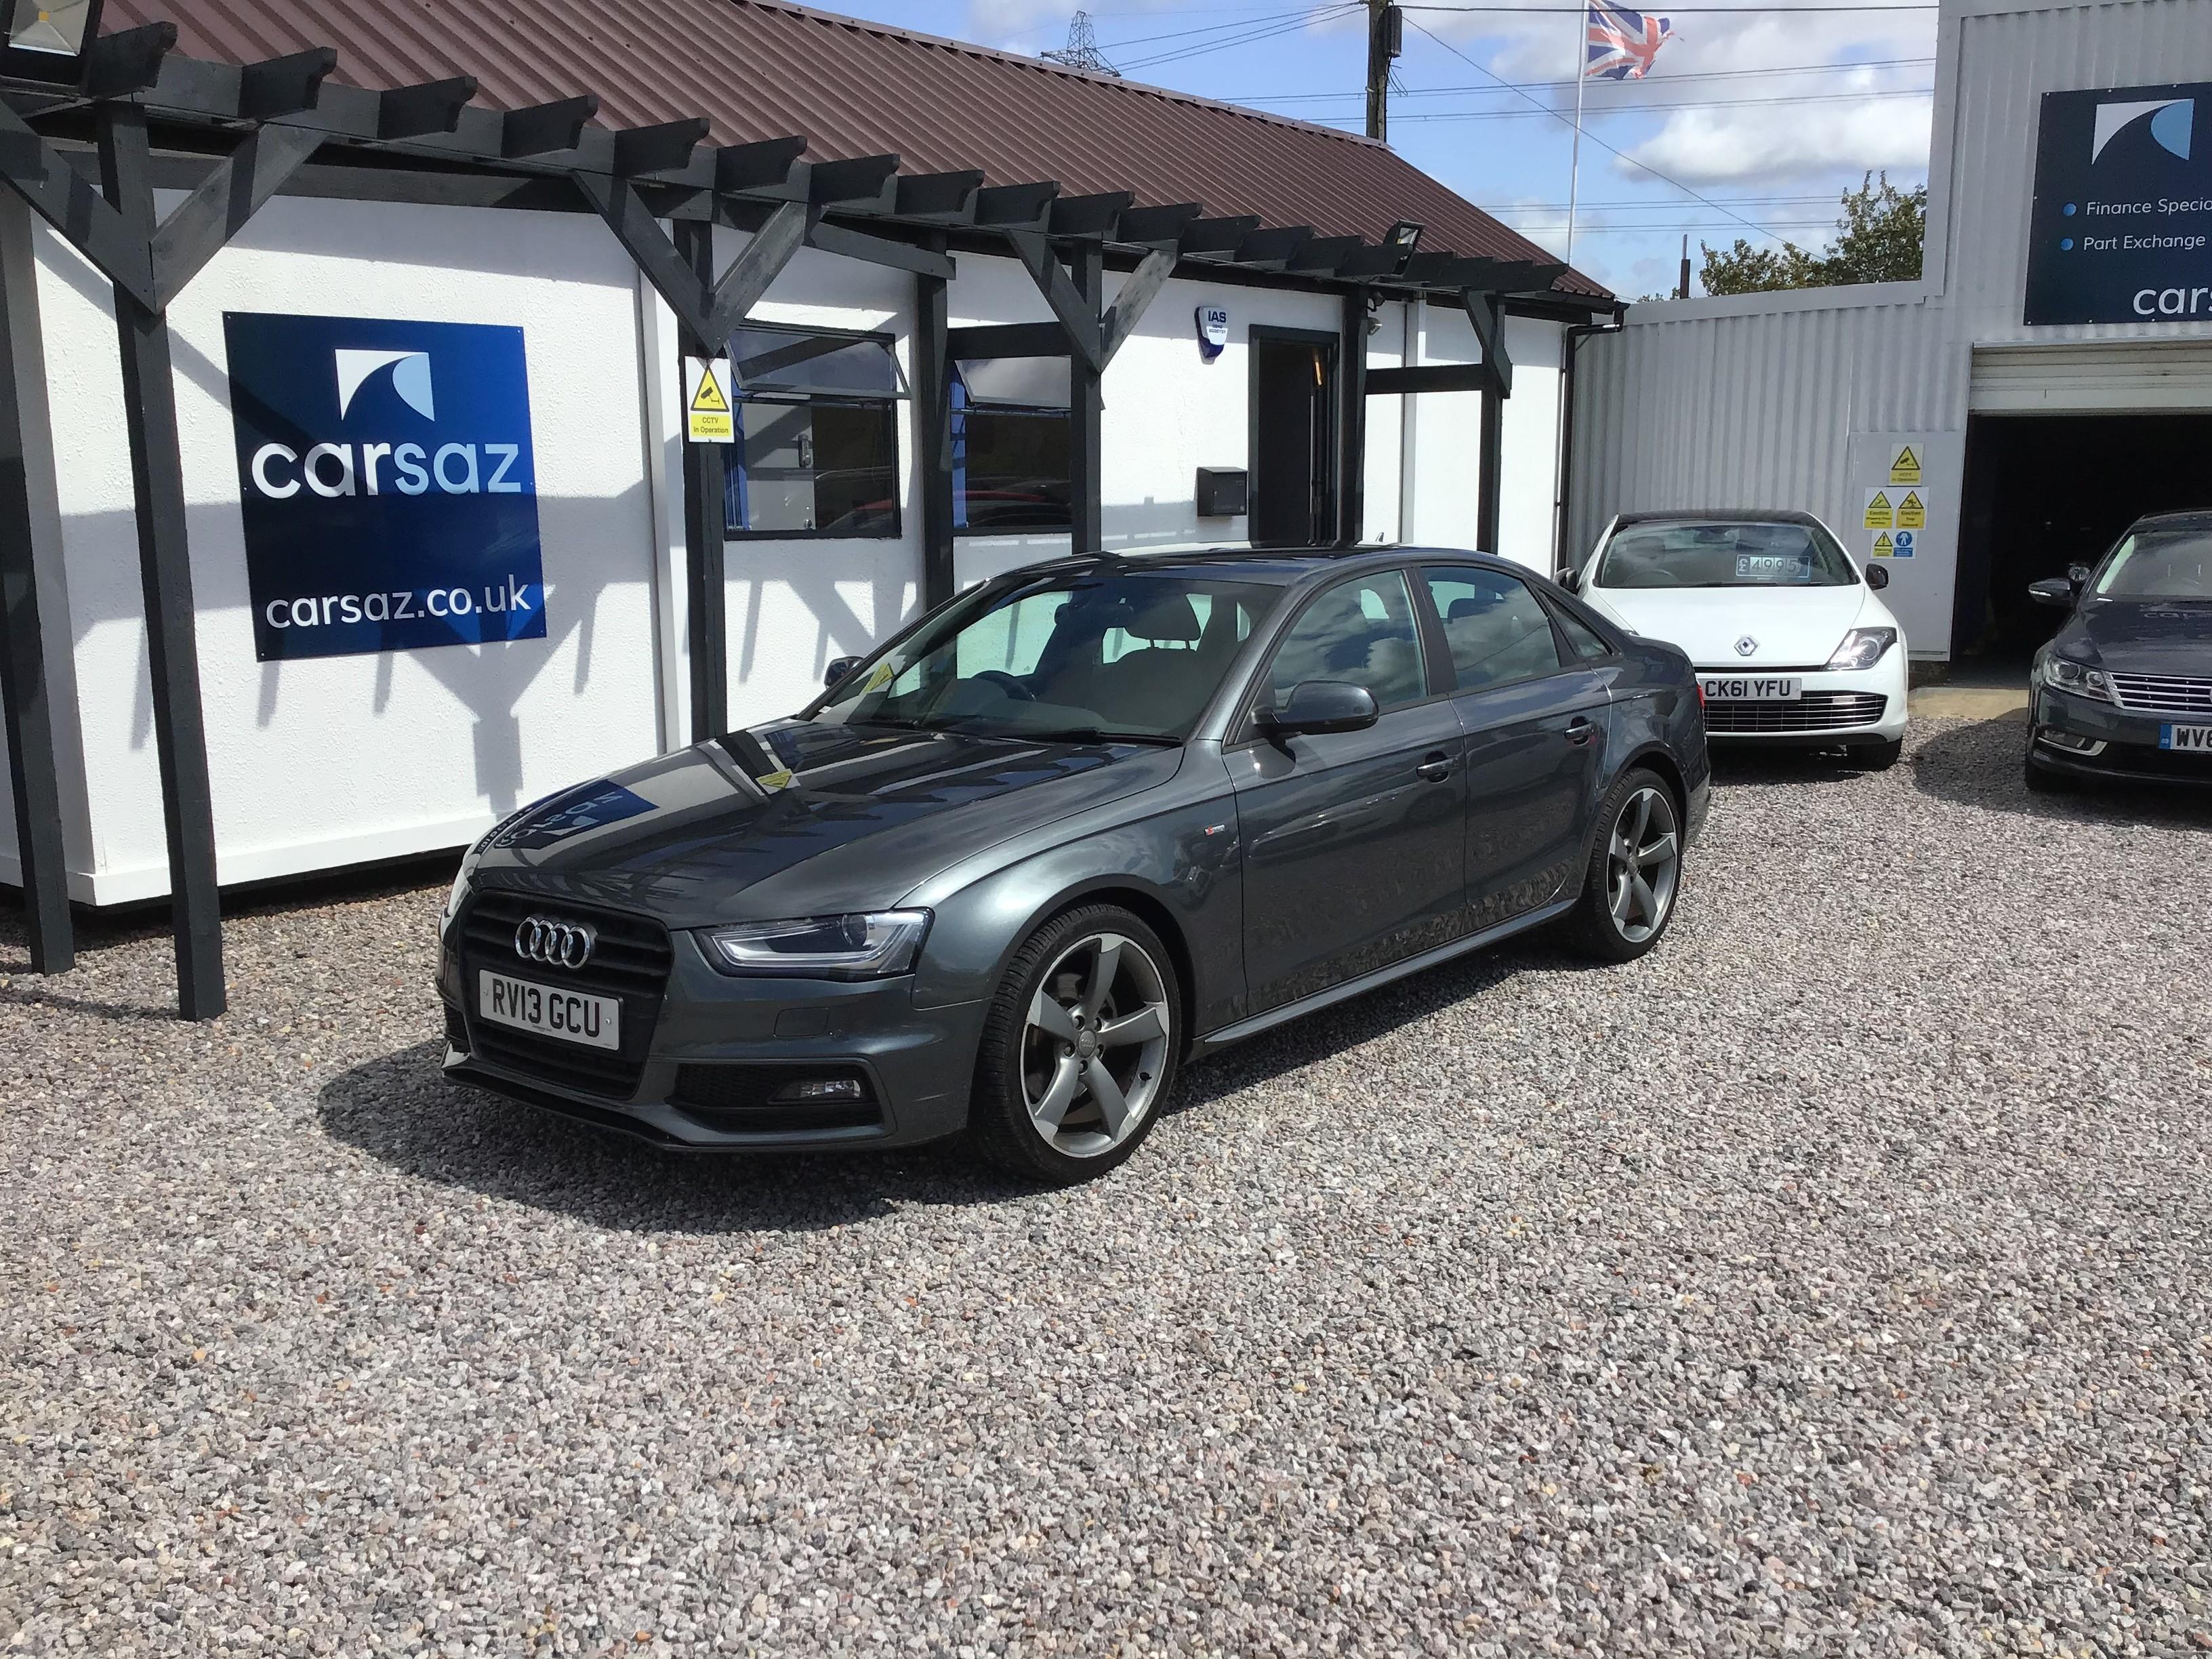 Audi A4 2.0 TDI 143 Black Edition 4dr Multitronic Exterior 1